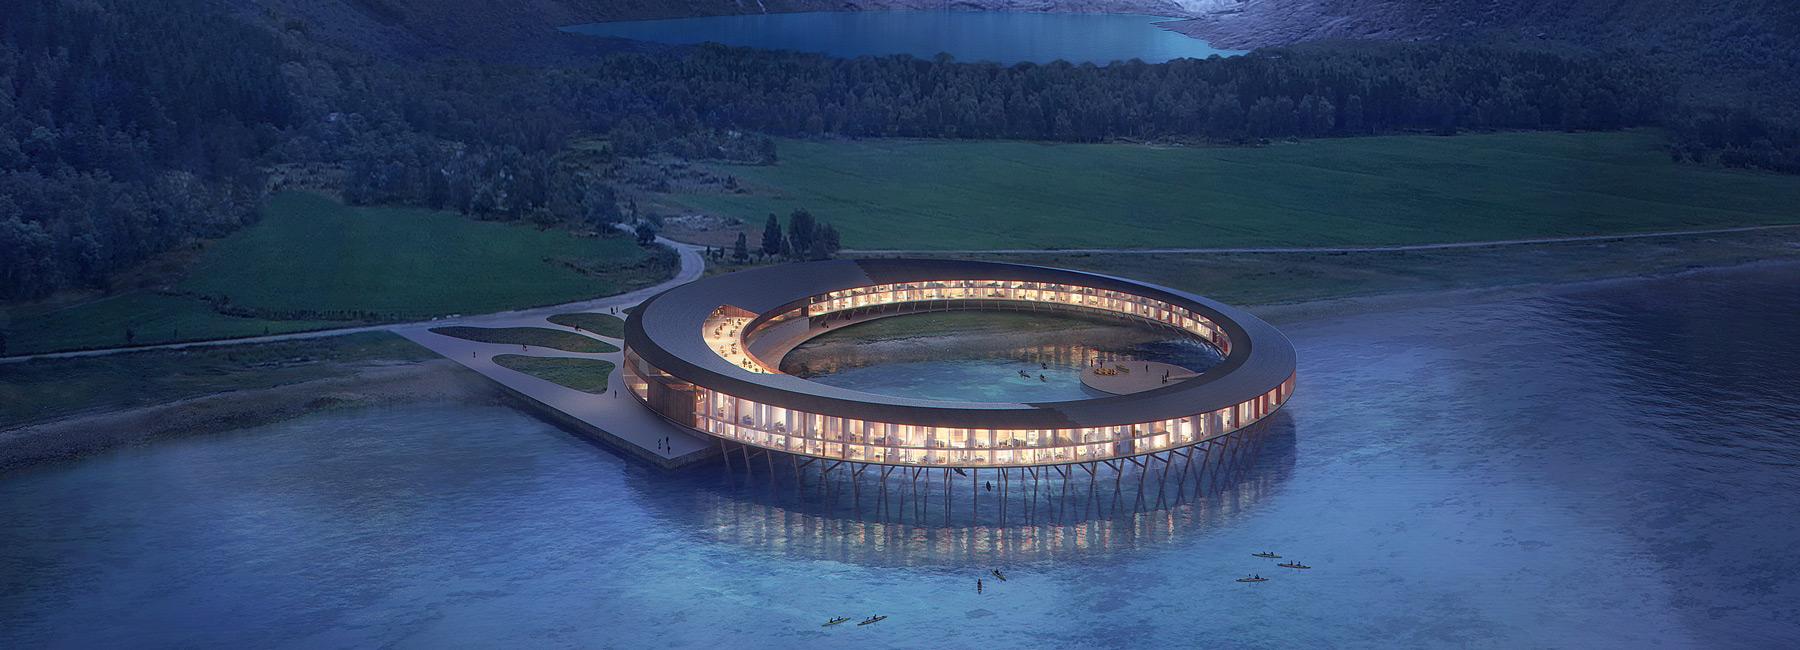 snohetta-svart-worlds-first-energy-positive-hotel-arctic-circle-designboom-1800.jpg